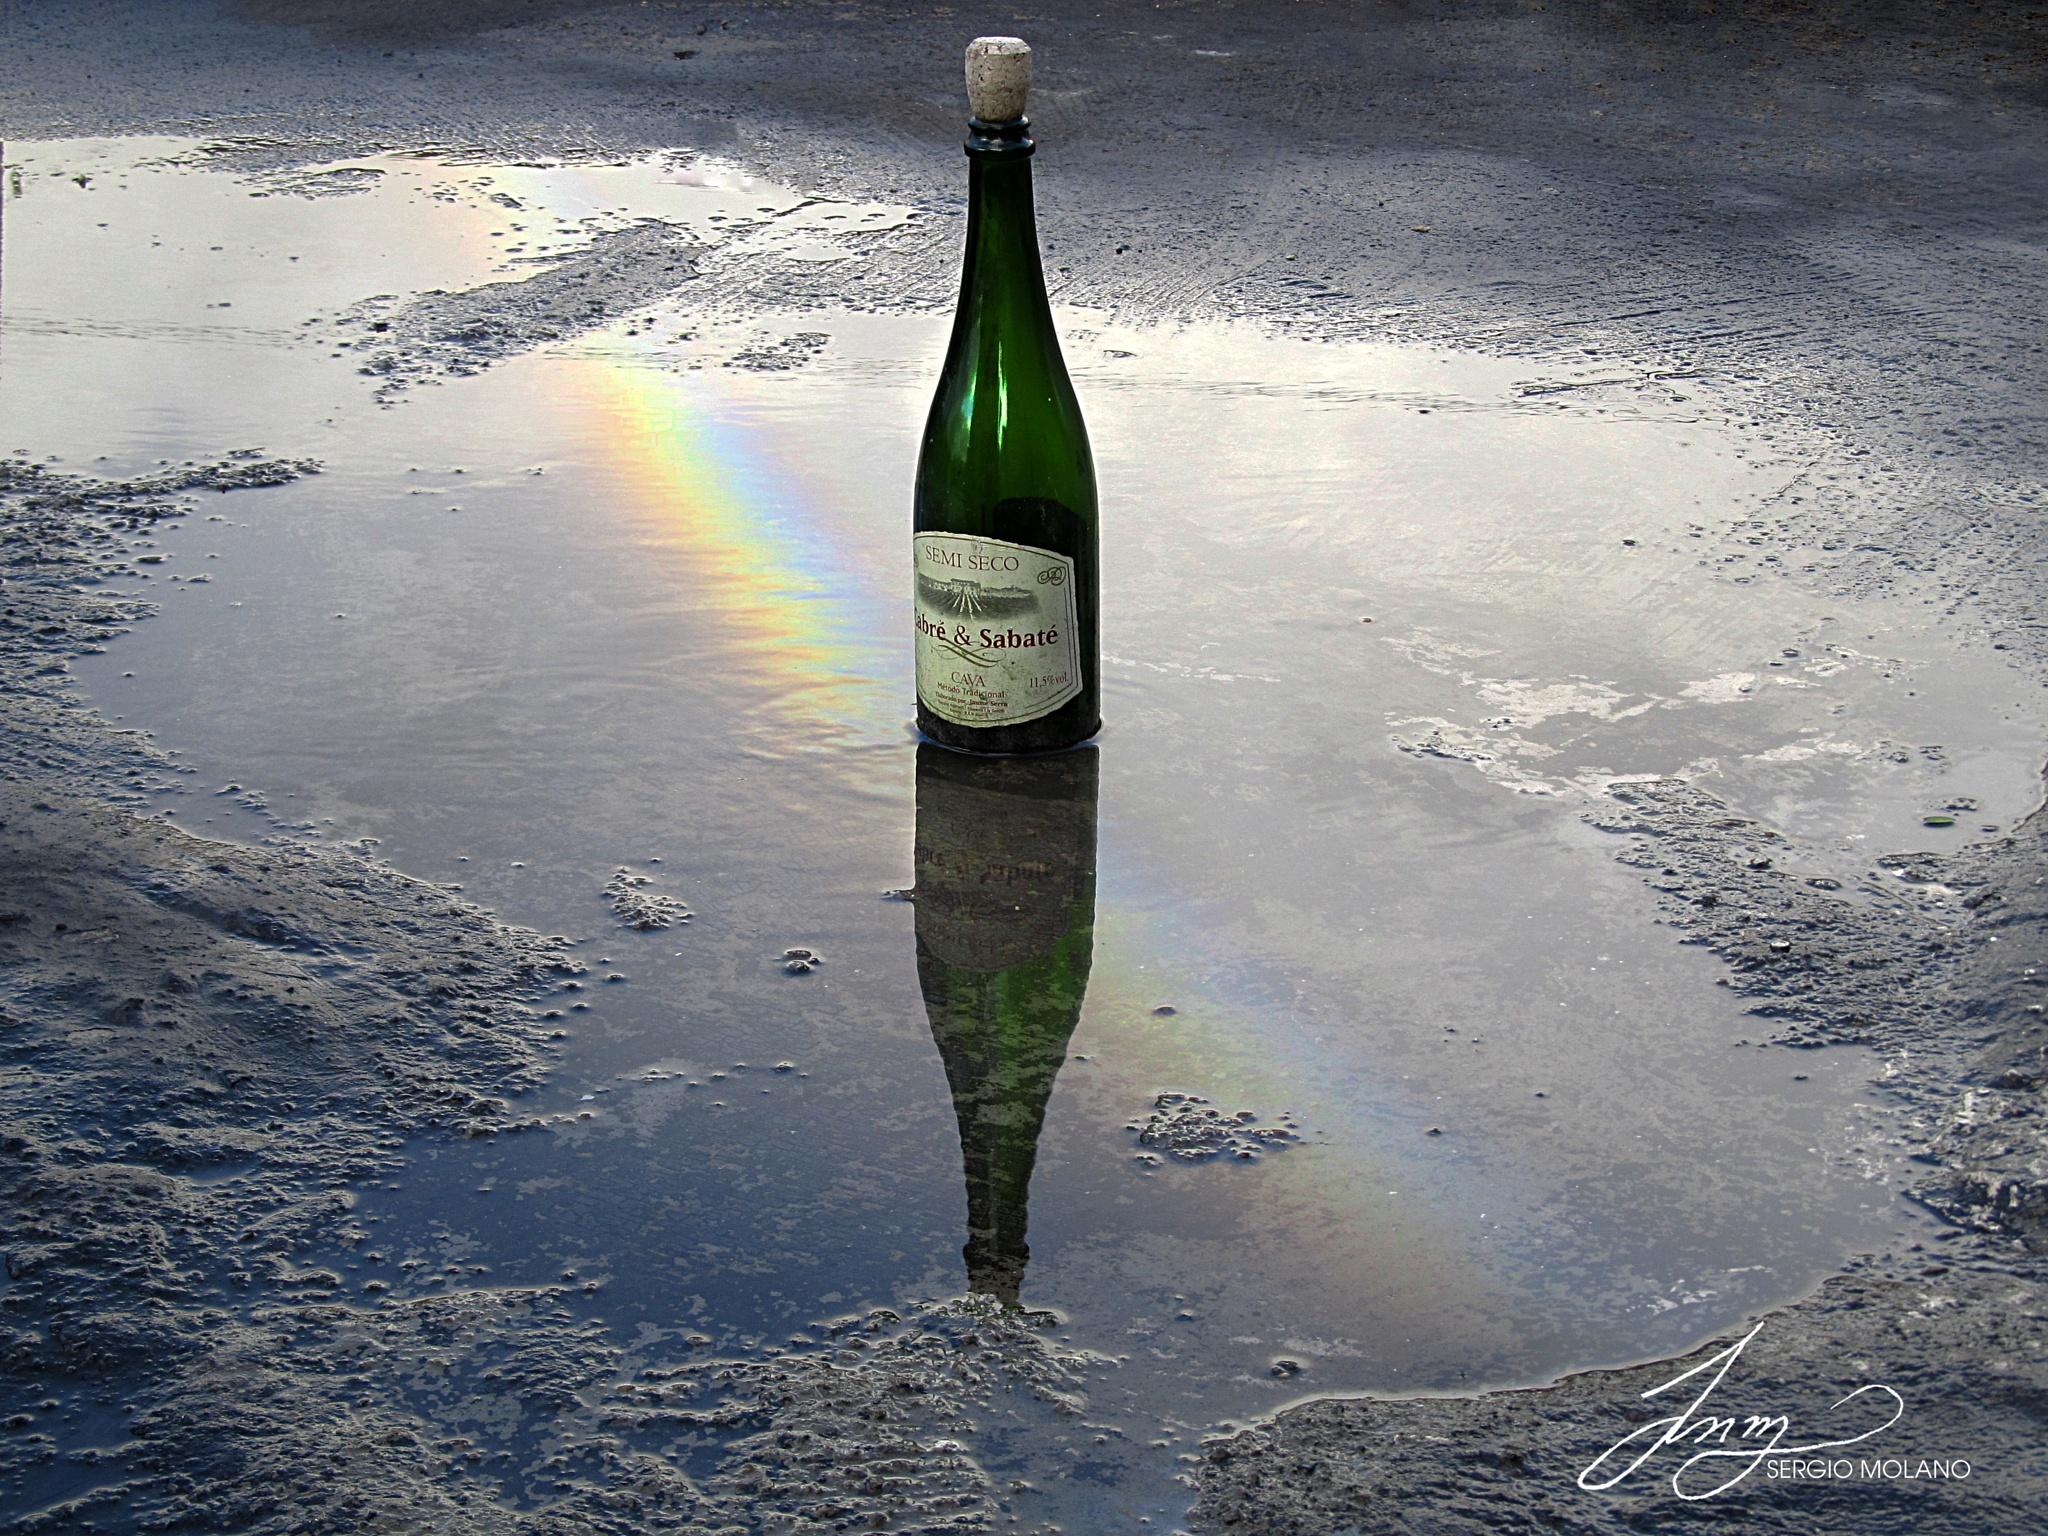 Rainbow reflection - Arcoiris reflejado. by SERGIO